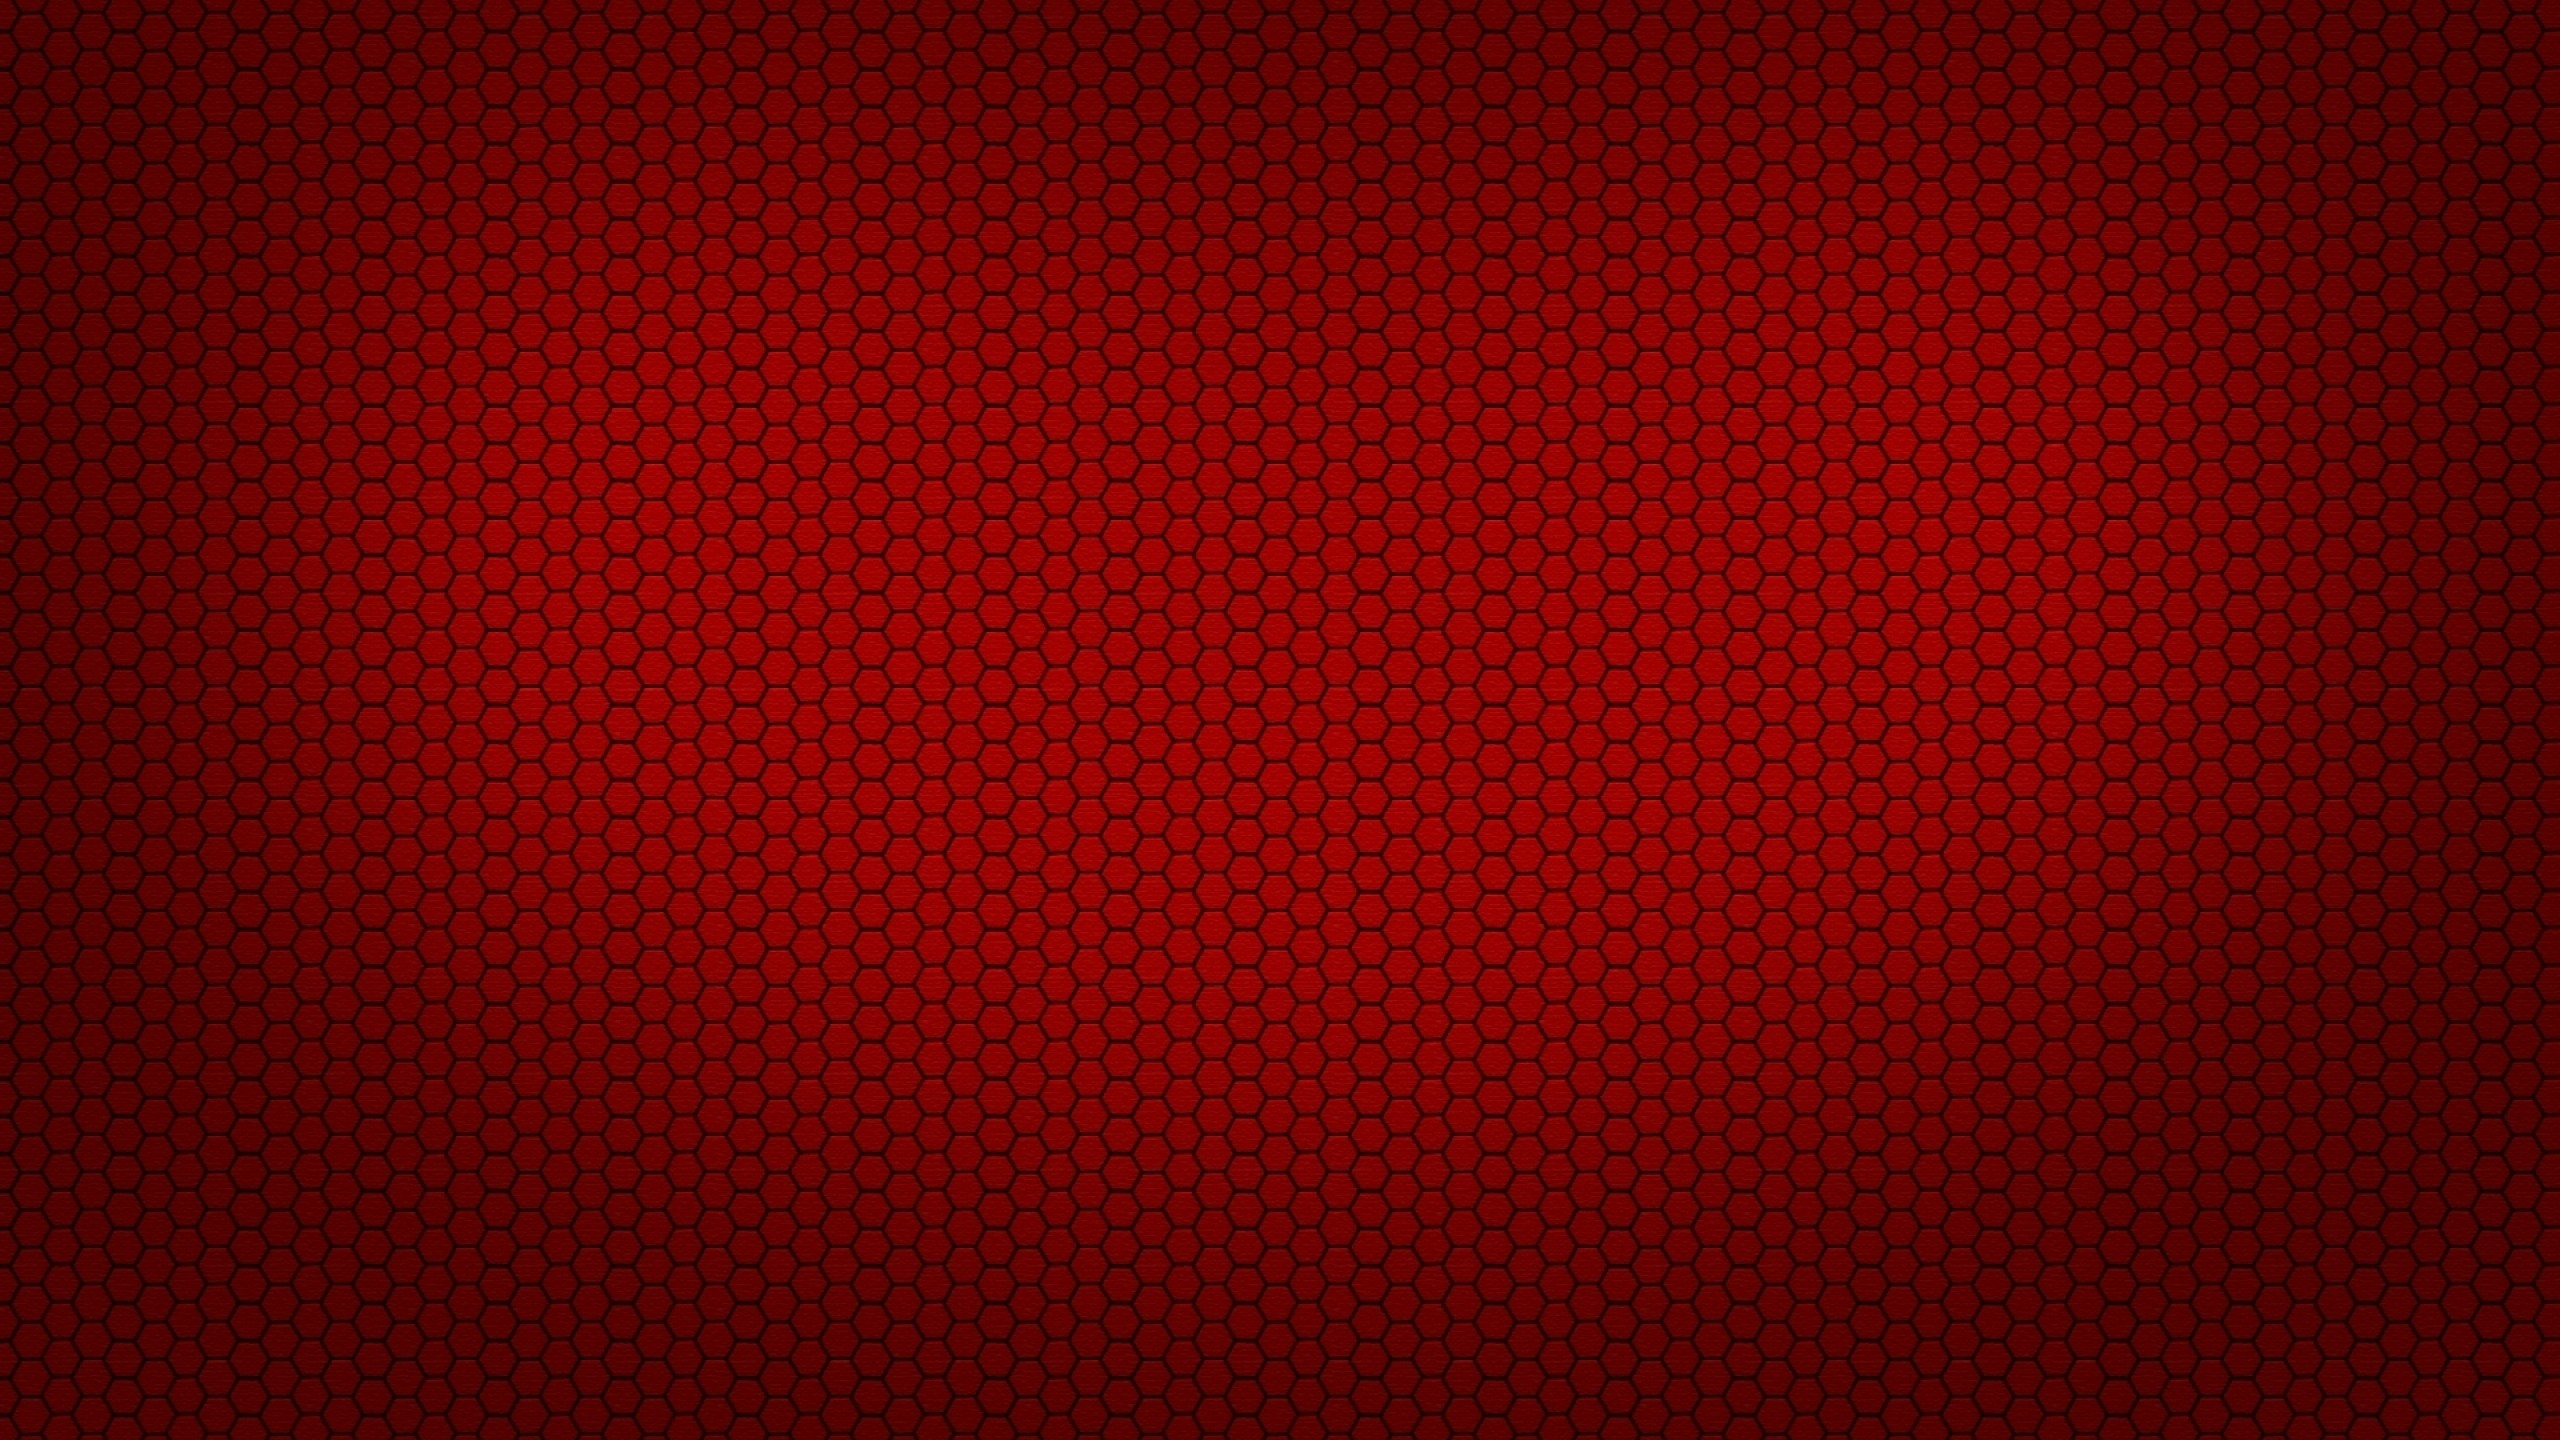 Free Elegant Wallpaper 22055 2560x1440 px